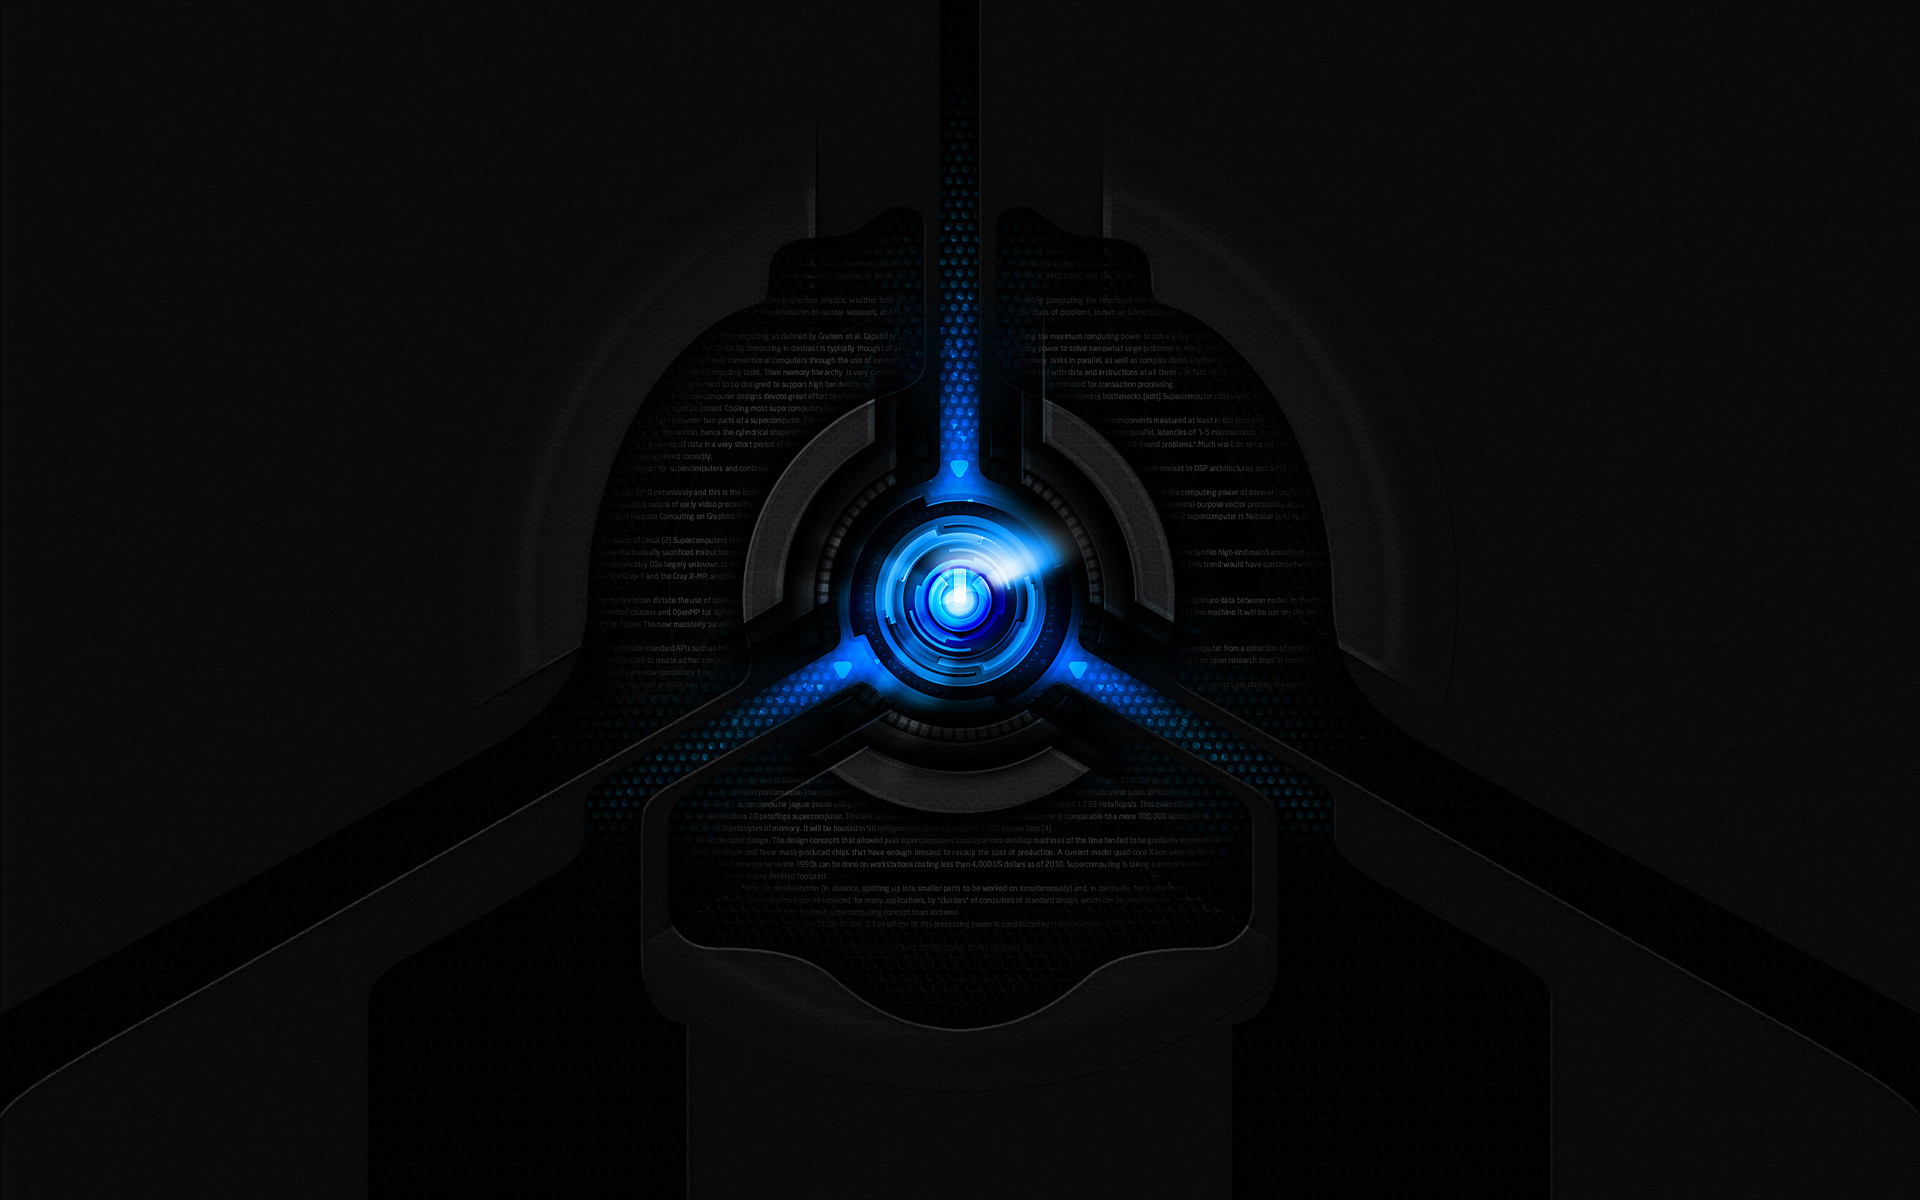 Black And Blue Logo Wallpaper HD 29919